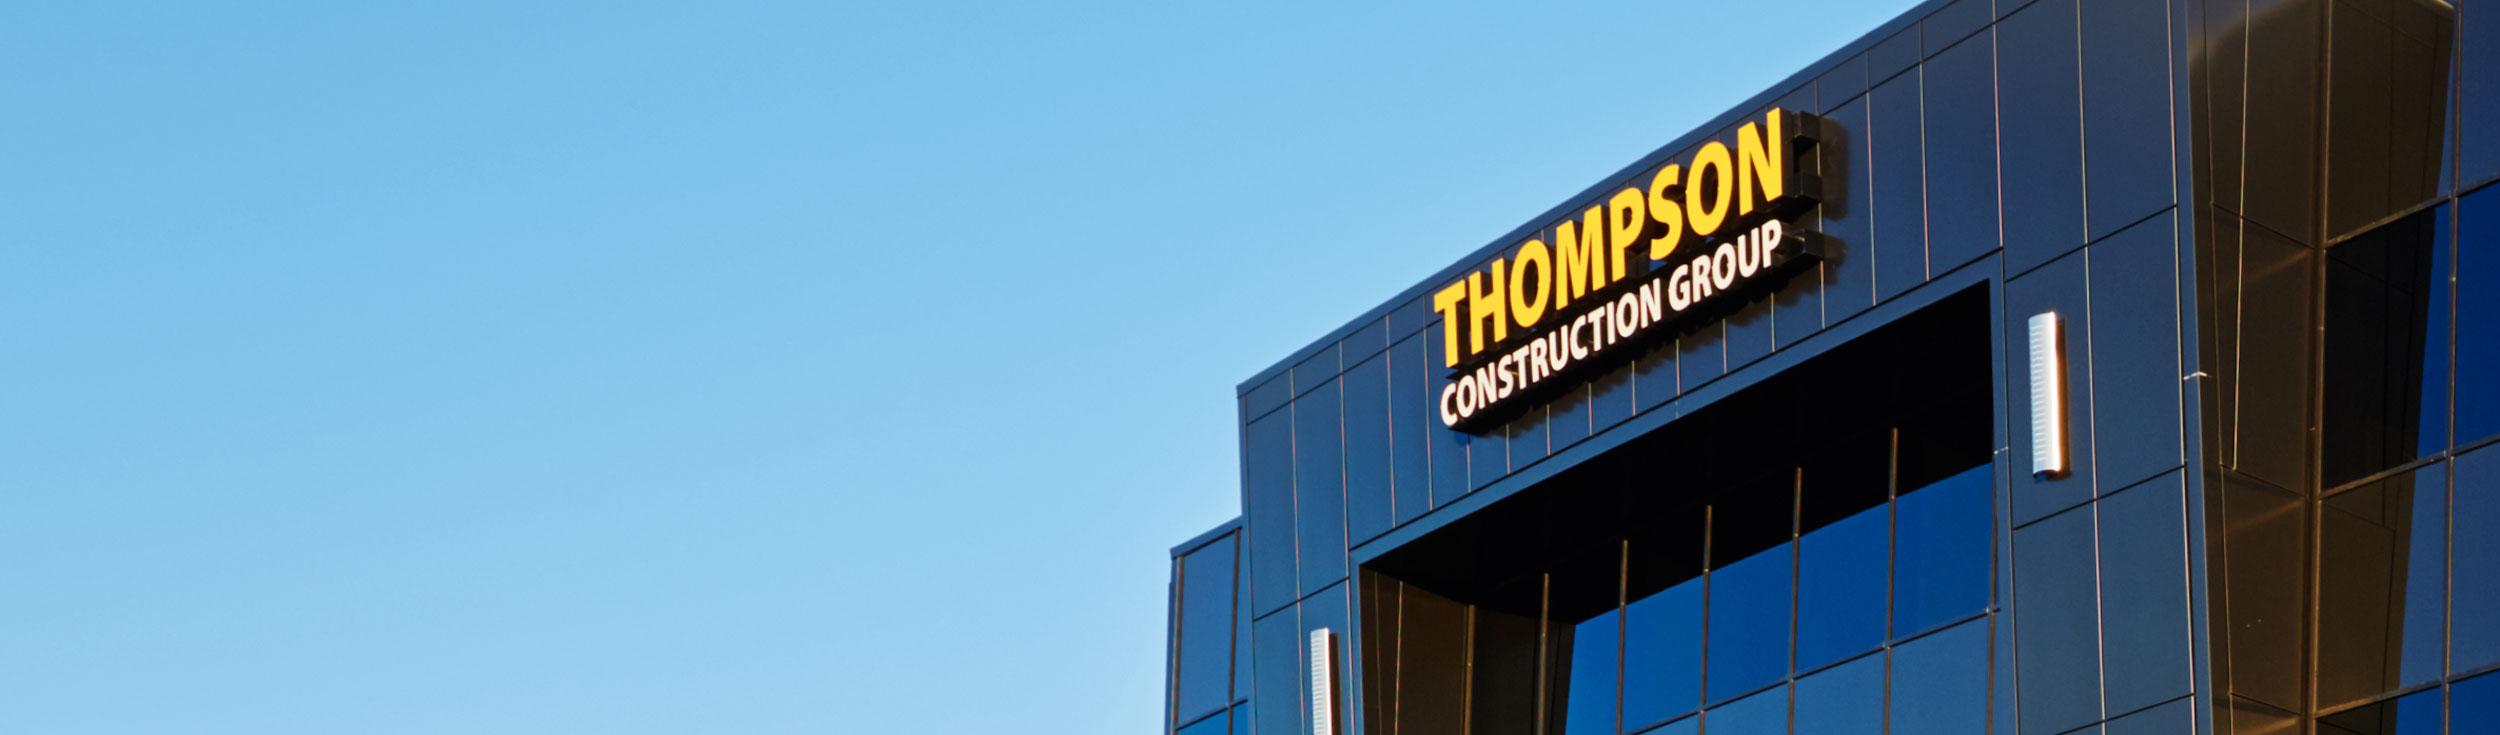 Thompson Construction Group